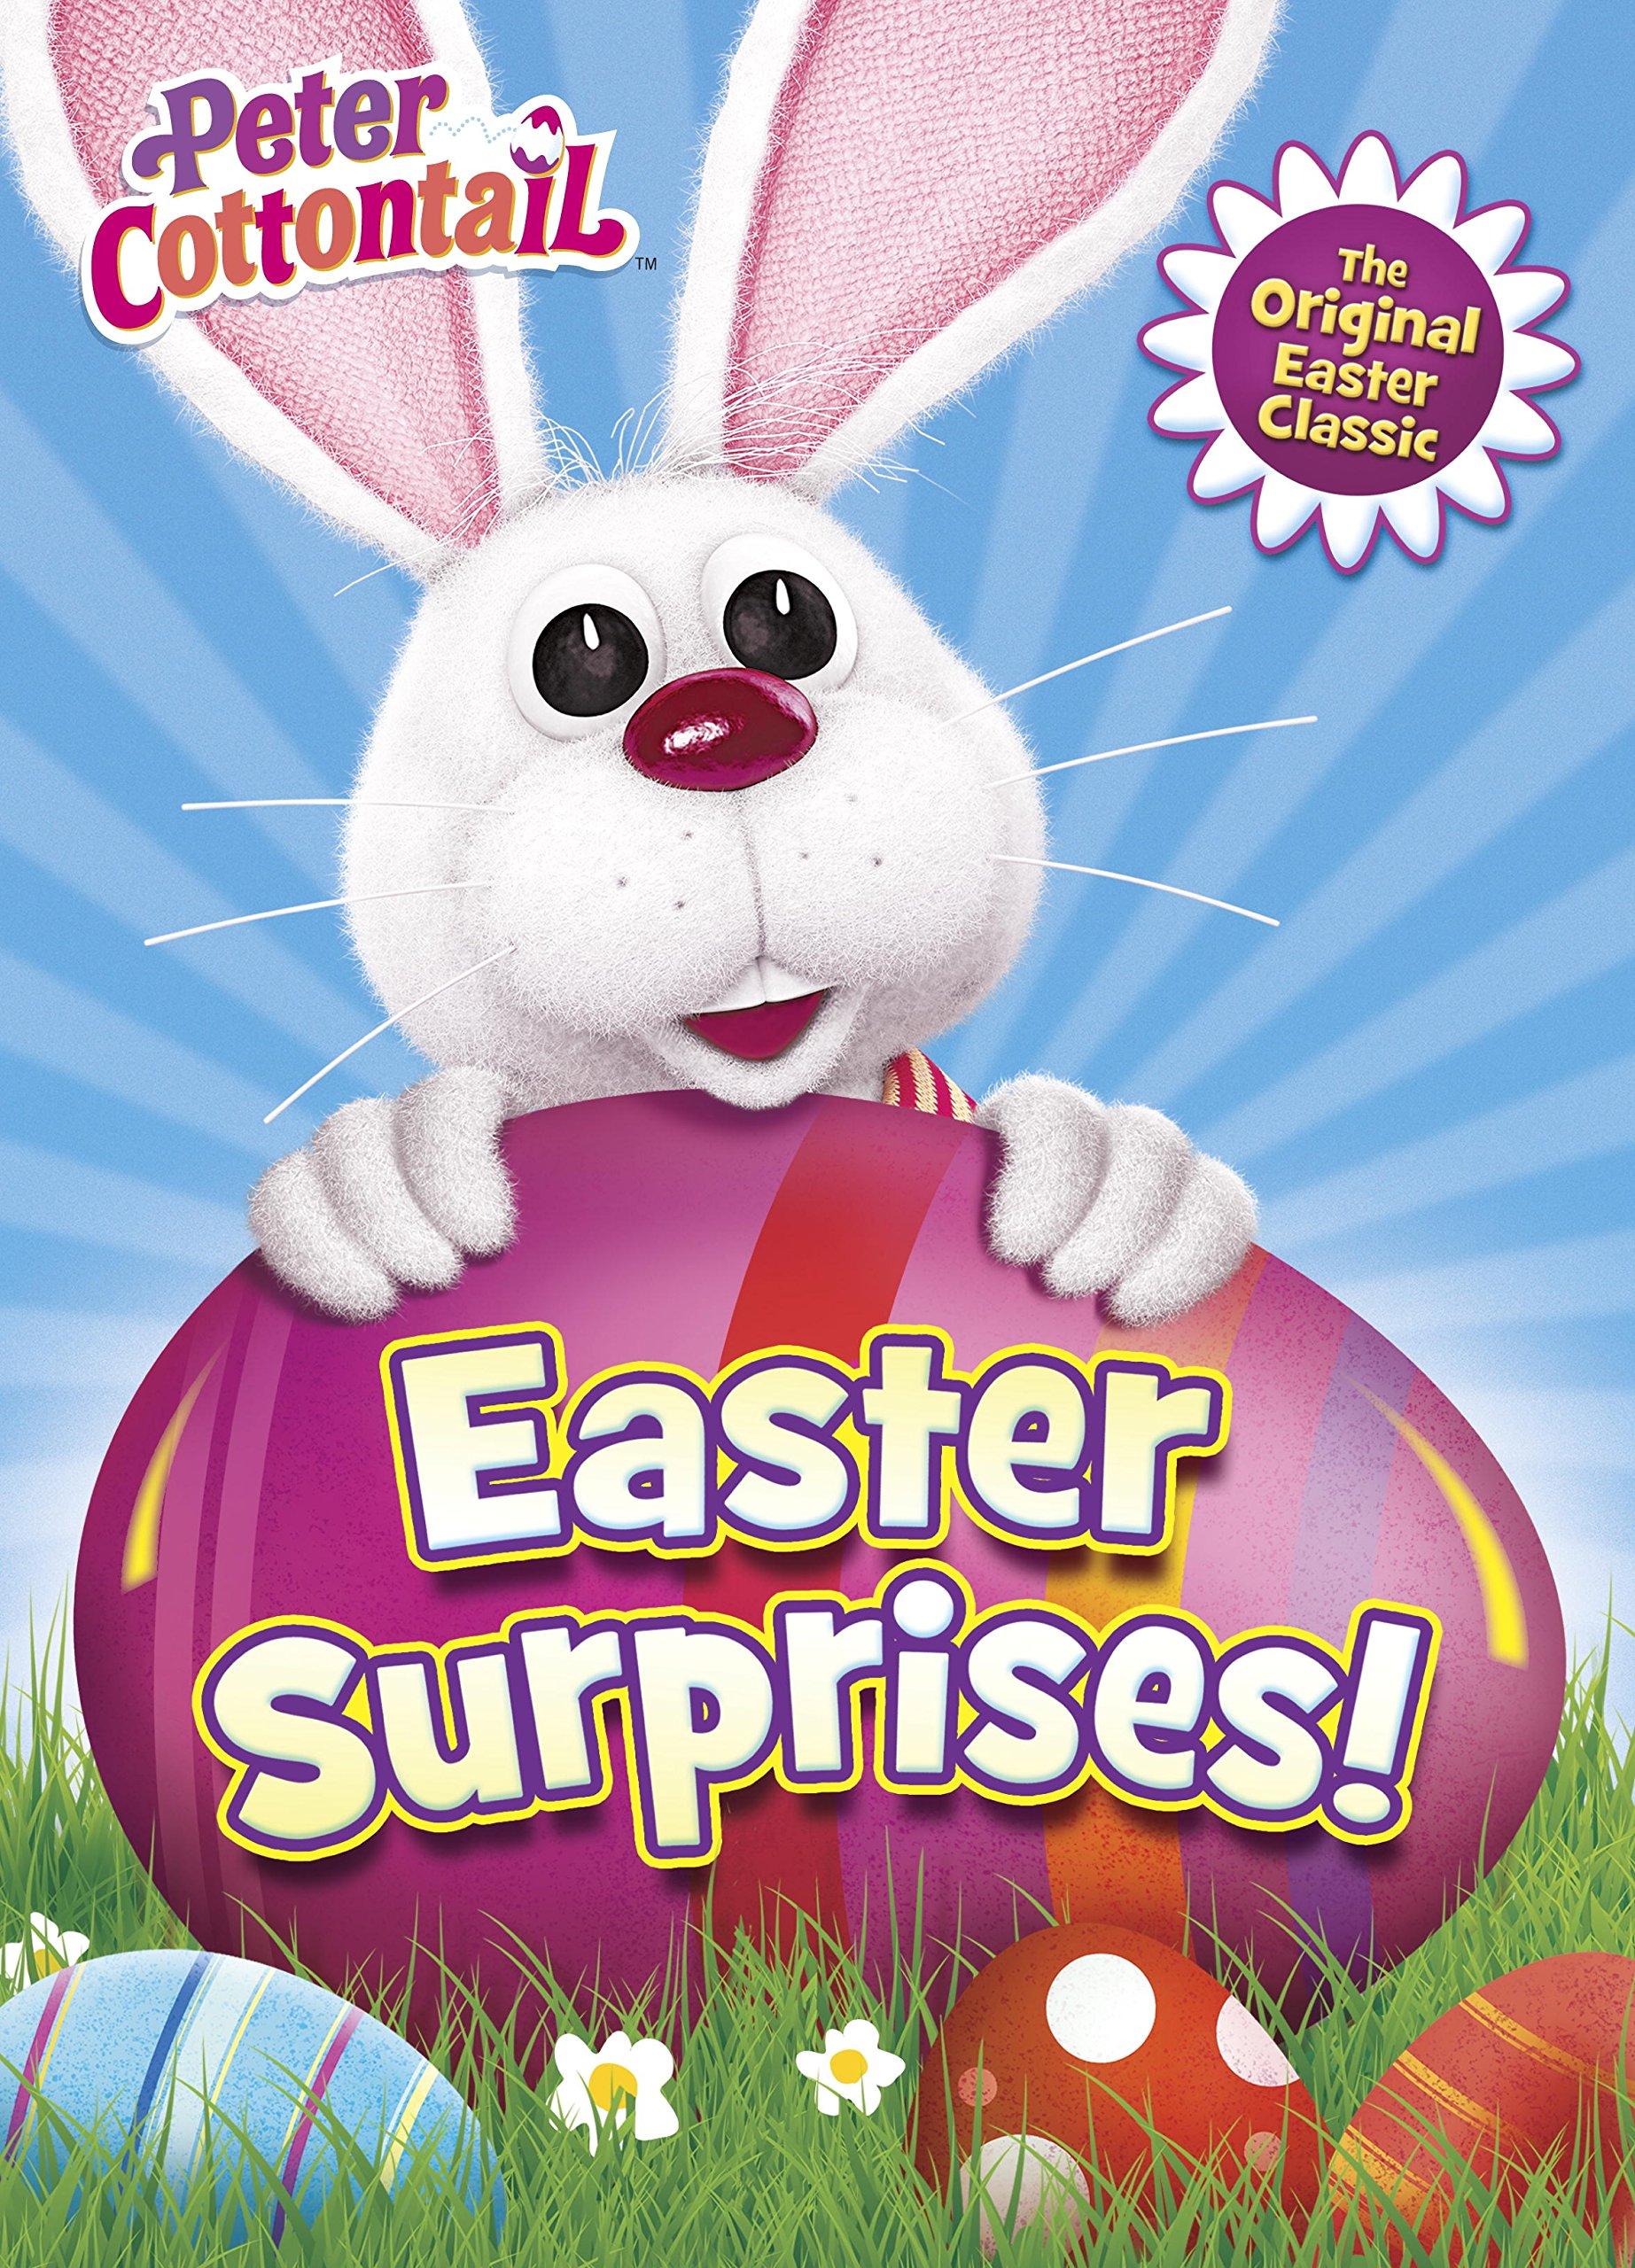 EASTER SURPRISES! -